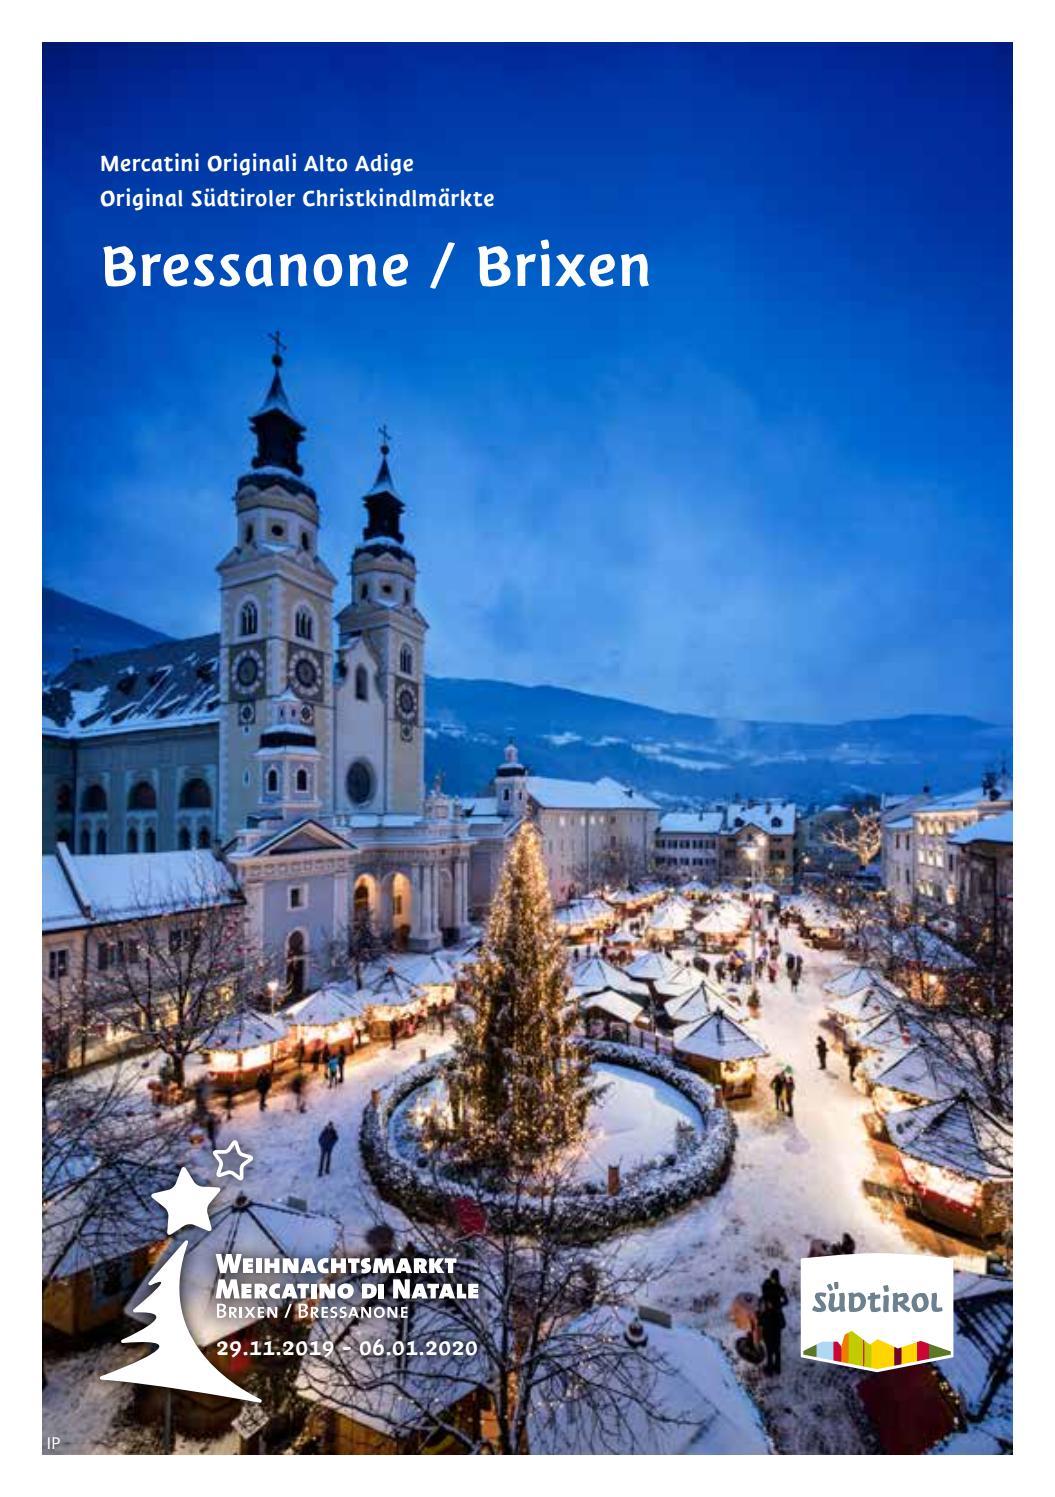 Kinder Calendario Avvento 2020.Mercatini Originali Alto Adige Bressanone Original